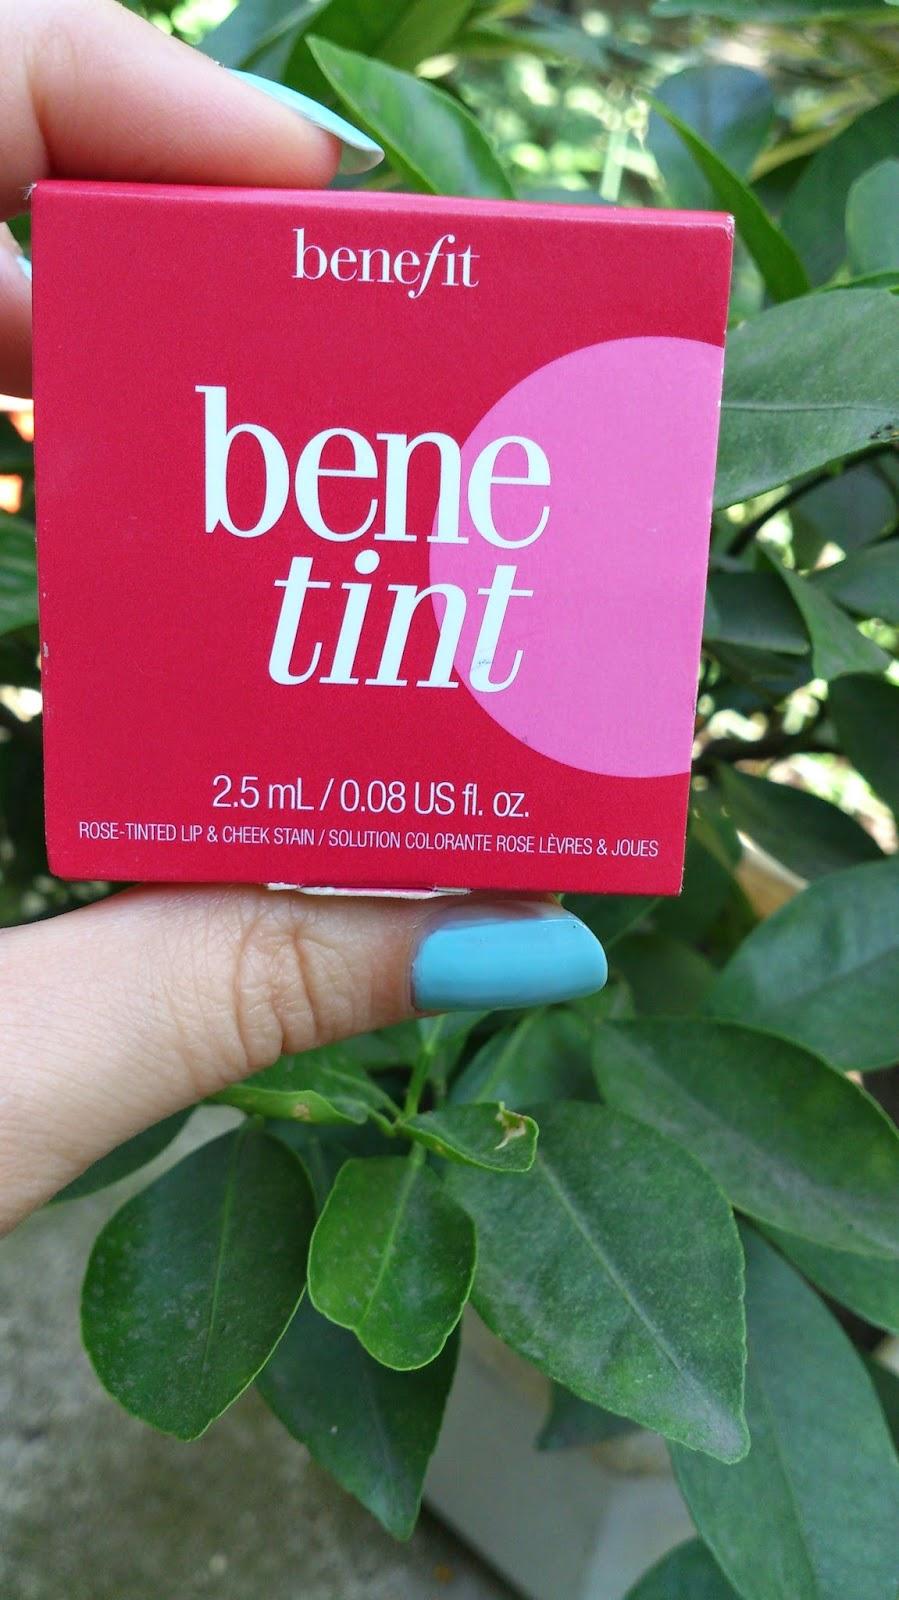 Benefit benetint и Tony Moly tony tint сравнение и отзыв